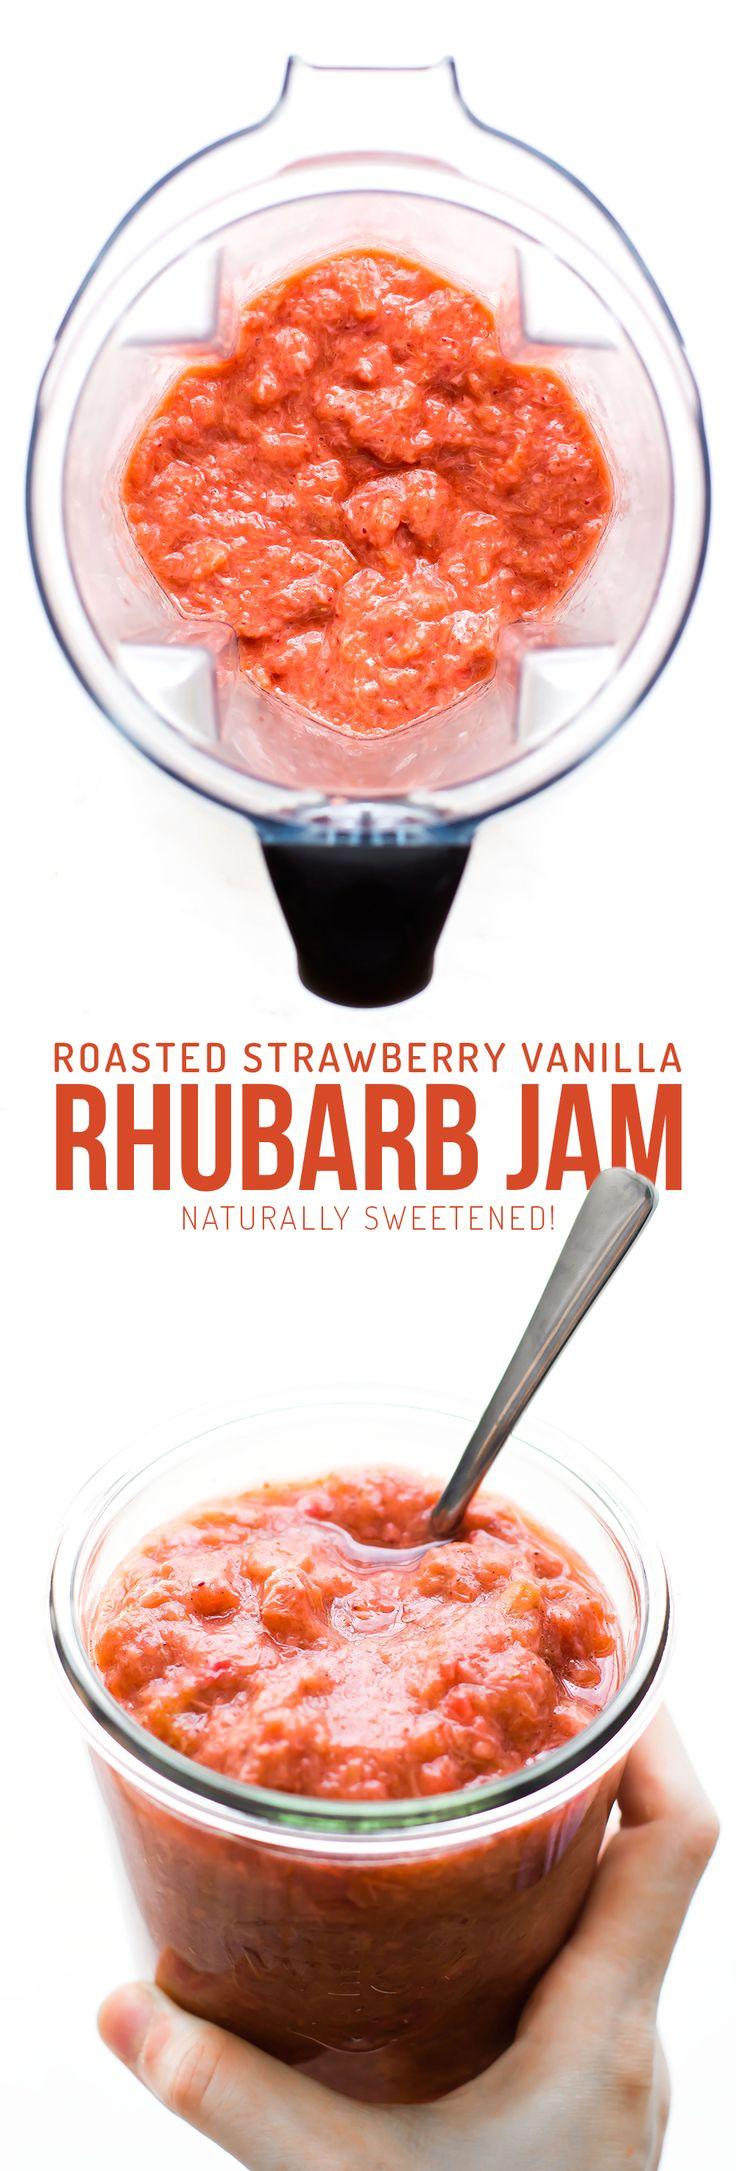 Roasted Strawberry Vanilla Bean Rhubarb Jam